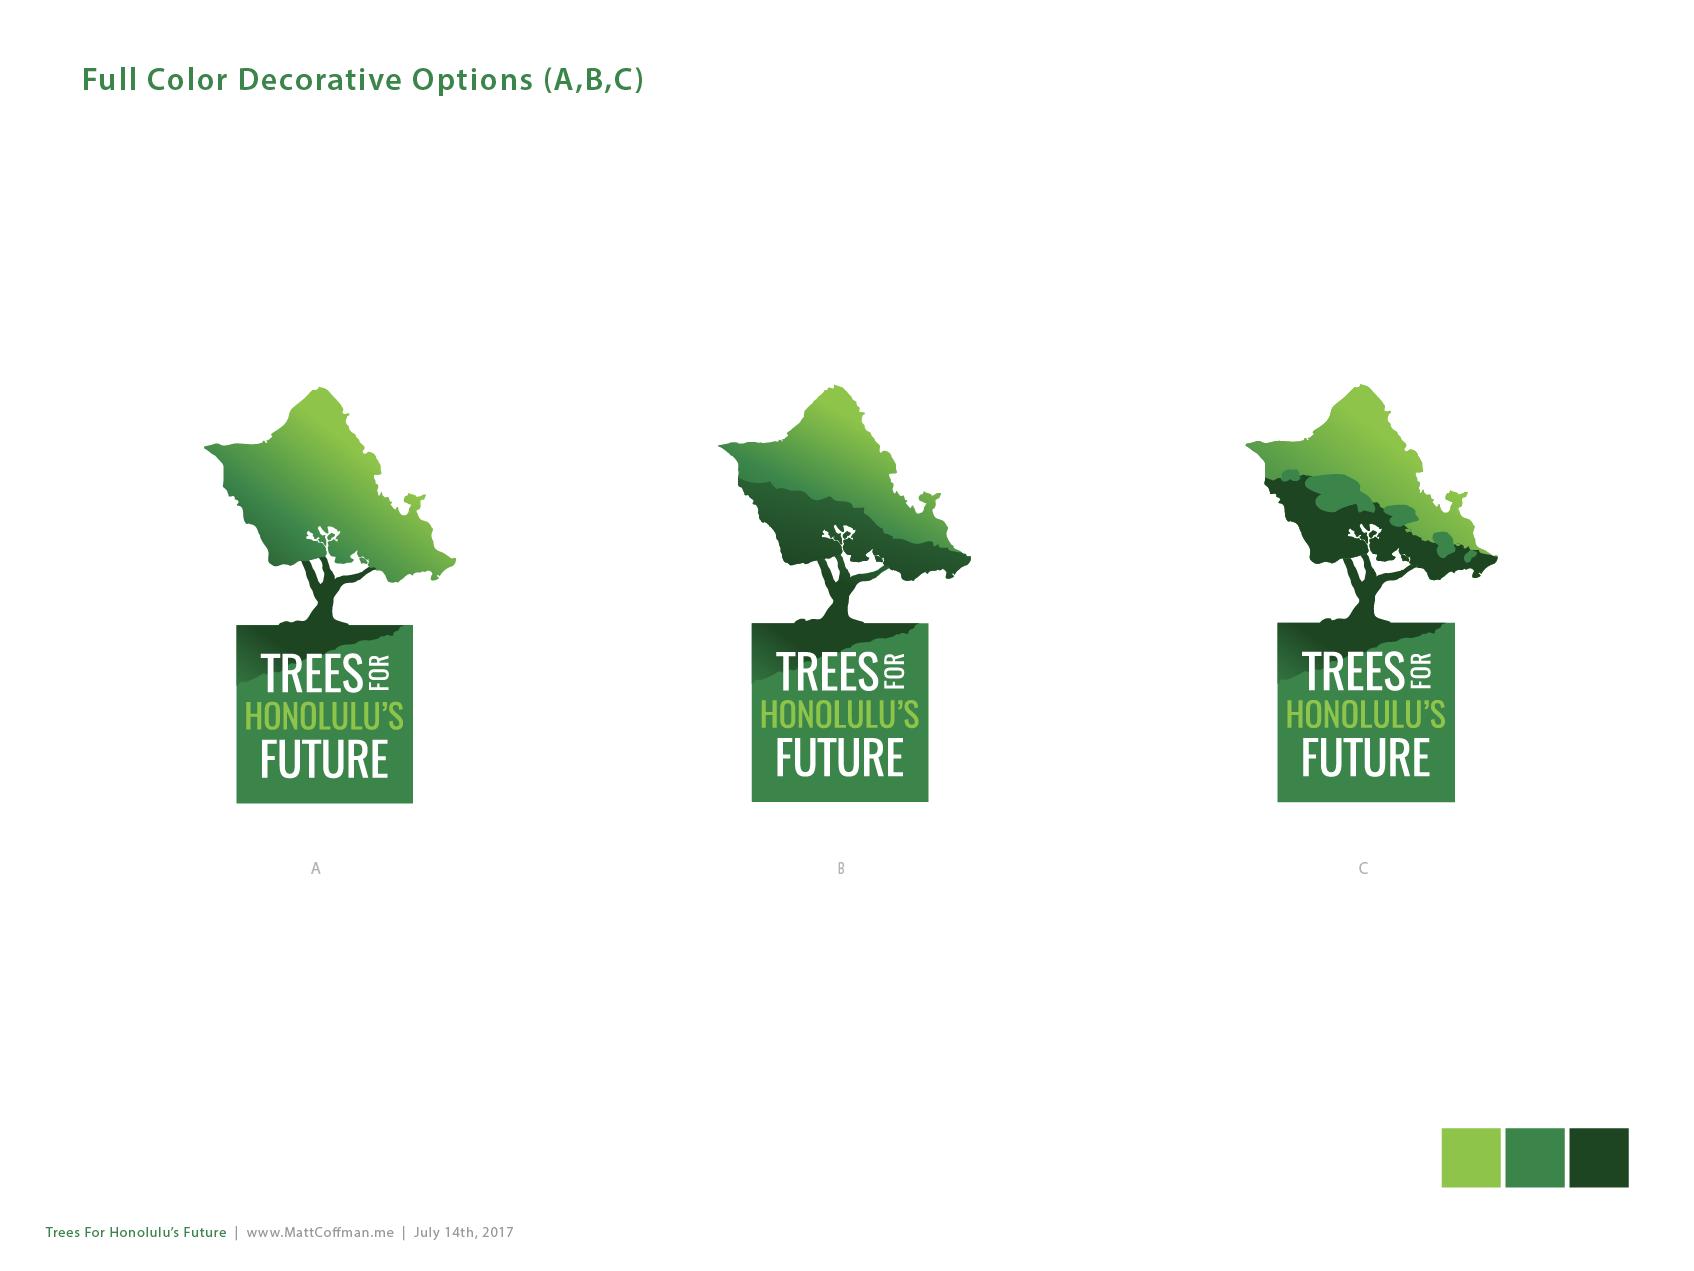 Trees for Honolulu's Future A, B, C Logo Options